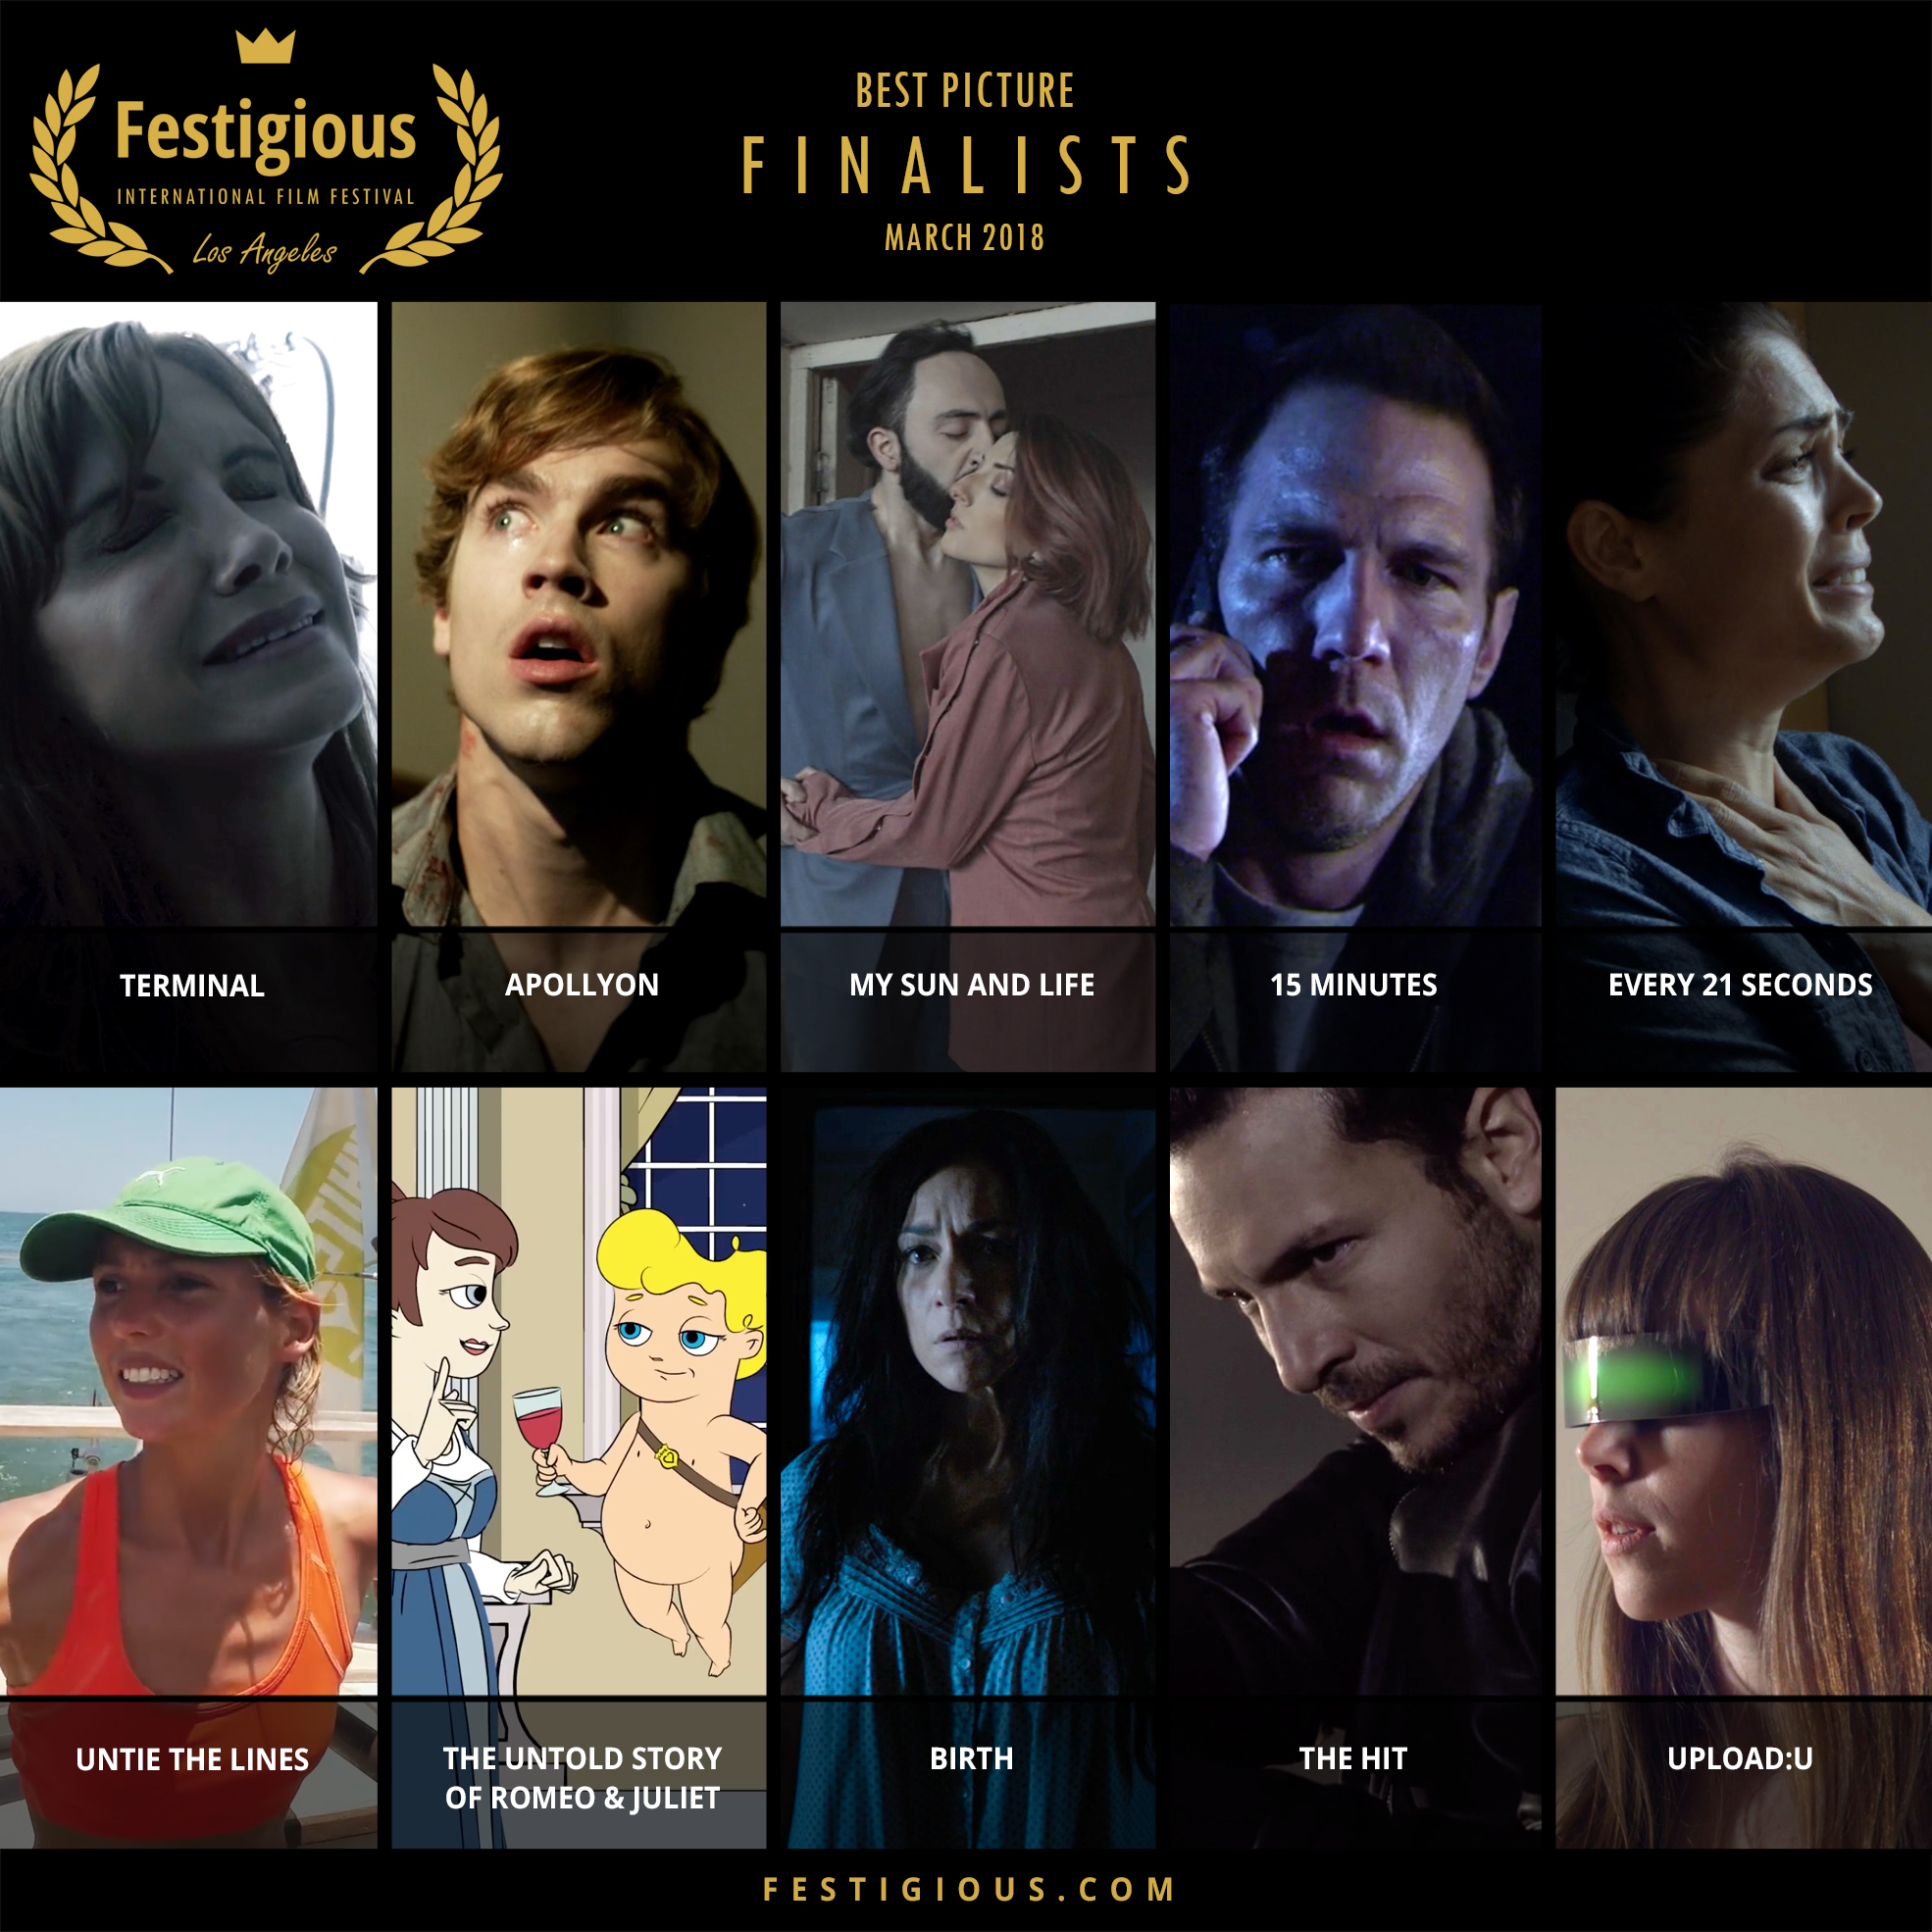 FESTIGIOUS FINALISTS 2018 03